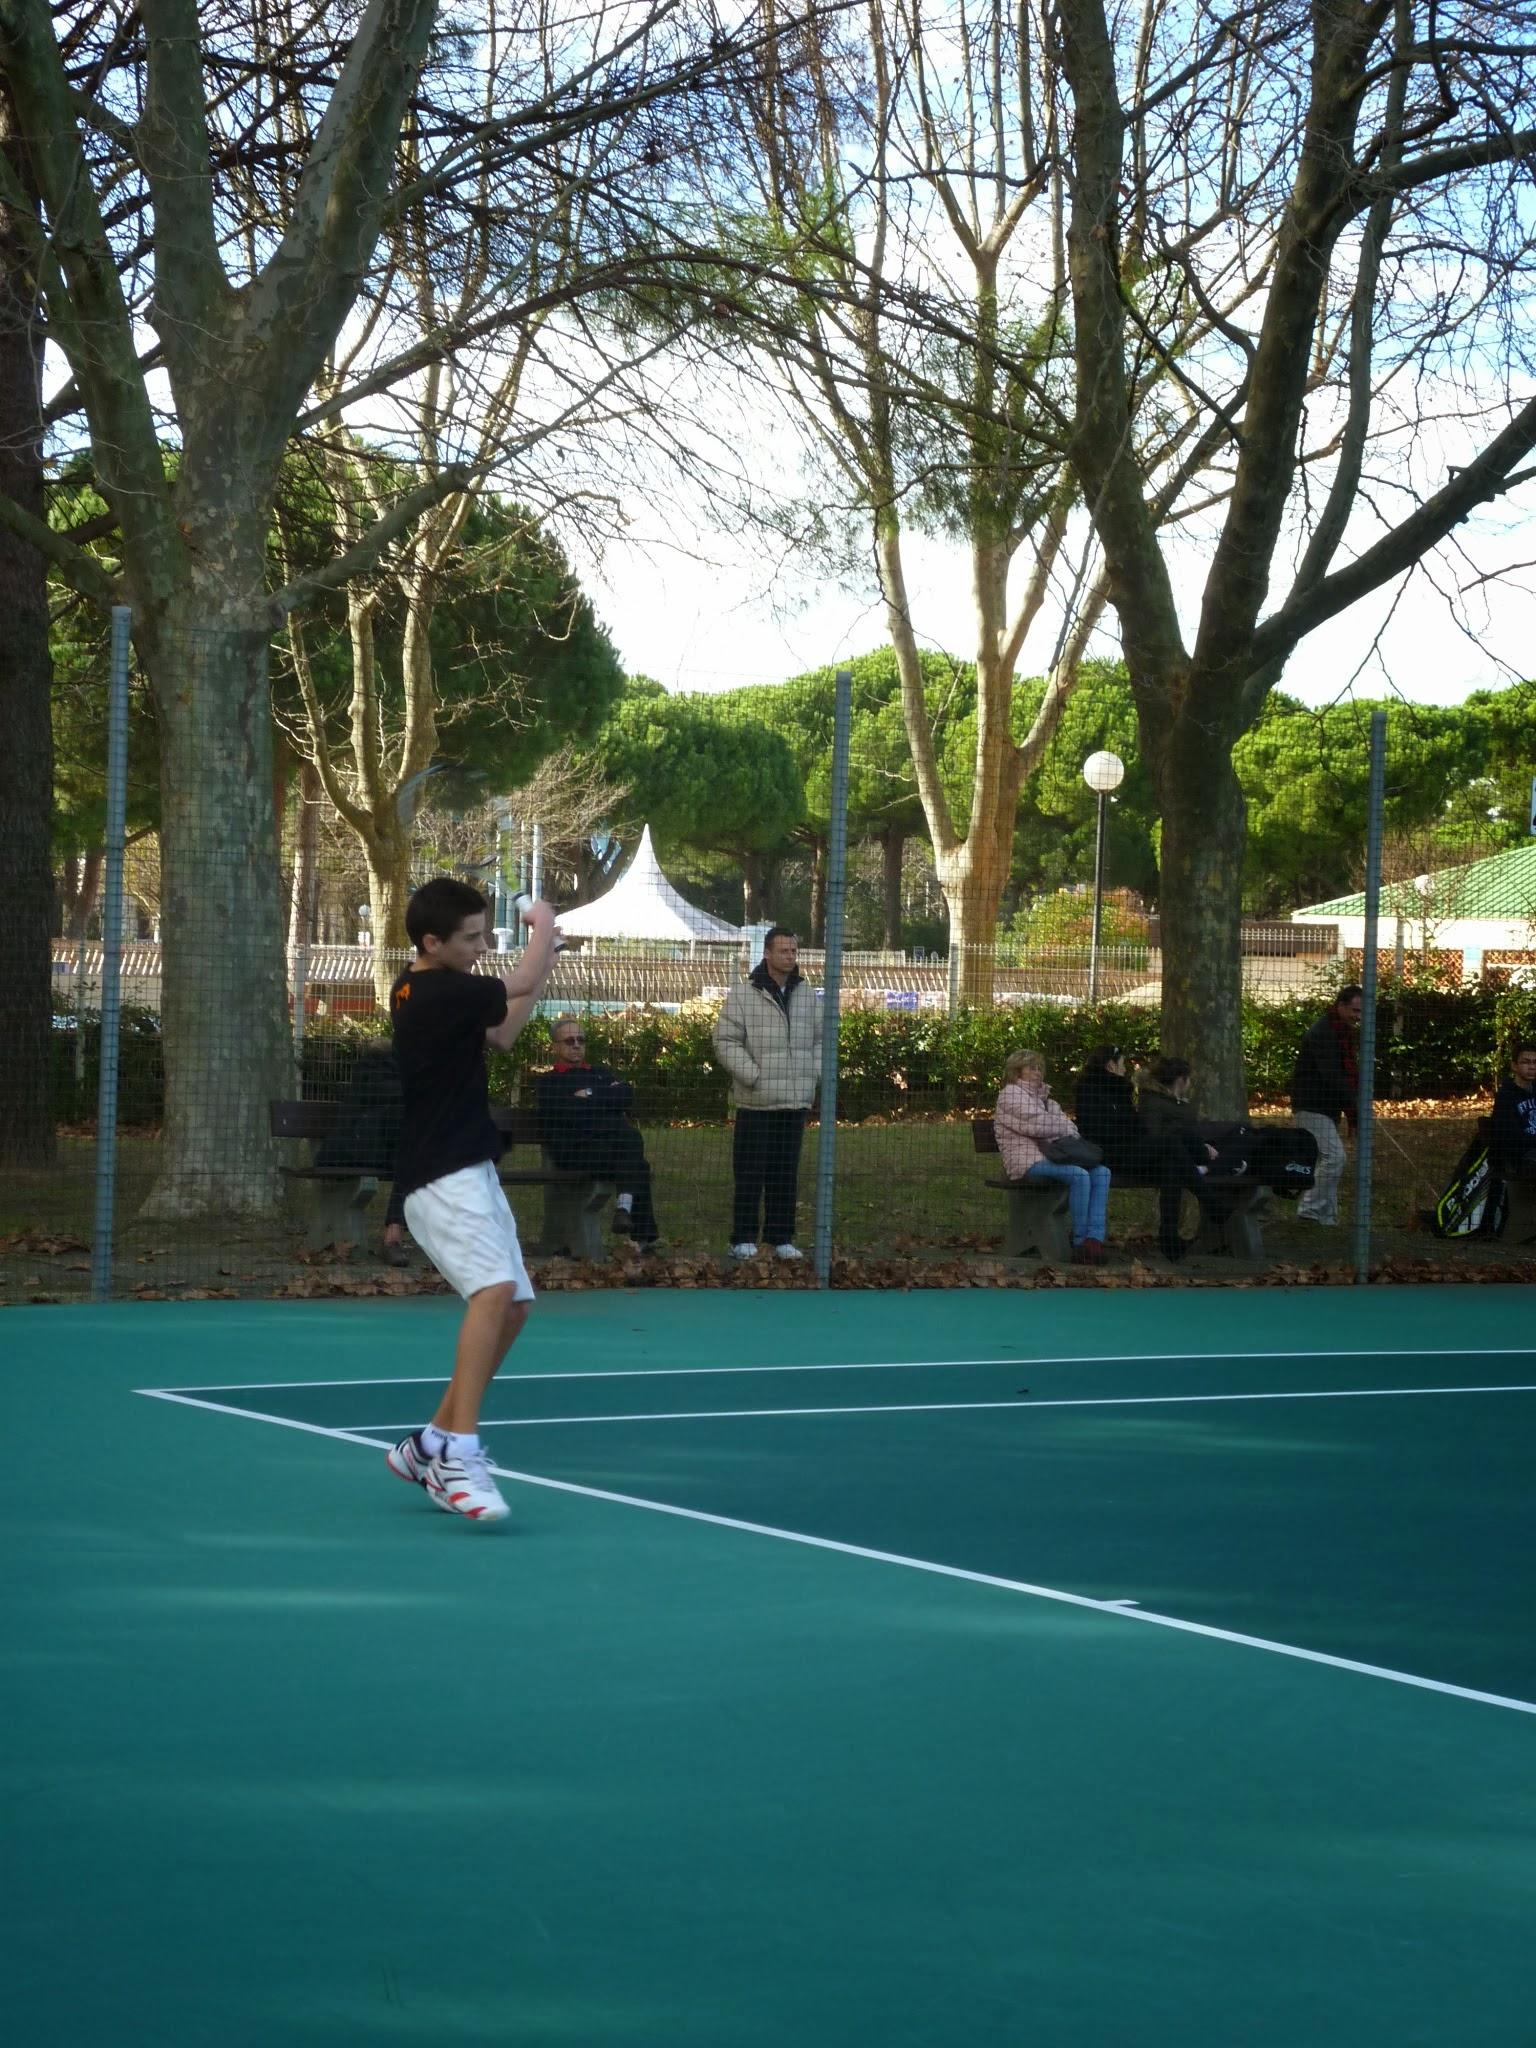 equipe des 15 16 ans vice championne r gionale tennis pierre rouge. Black Bedroom Furniture Sets. Home Design Ideas